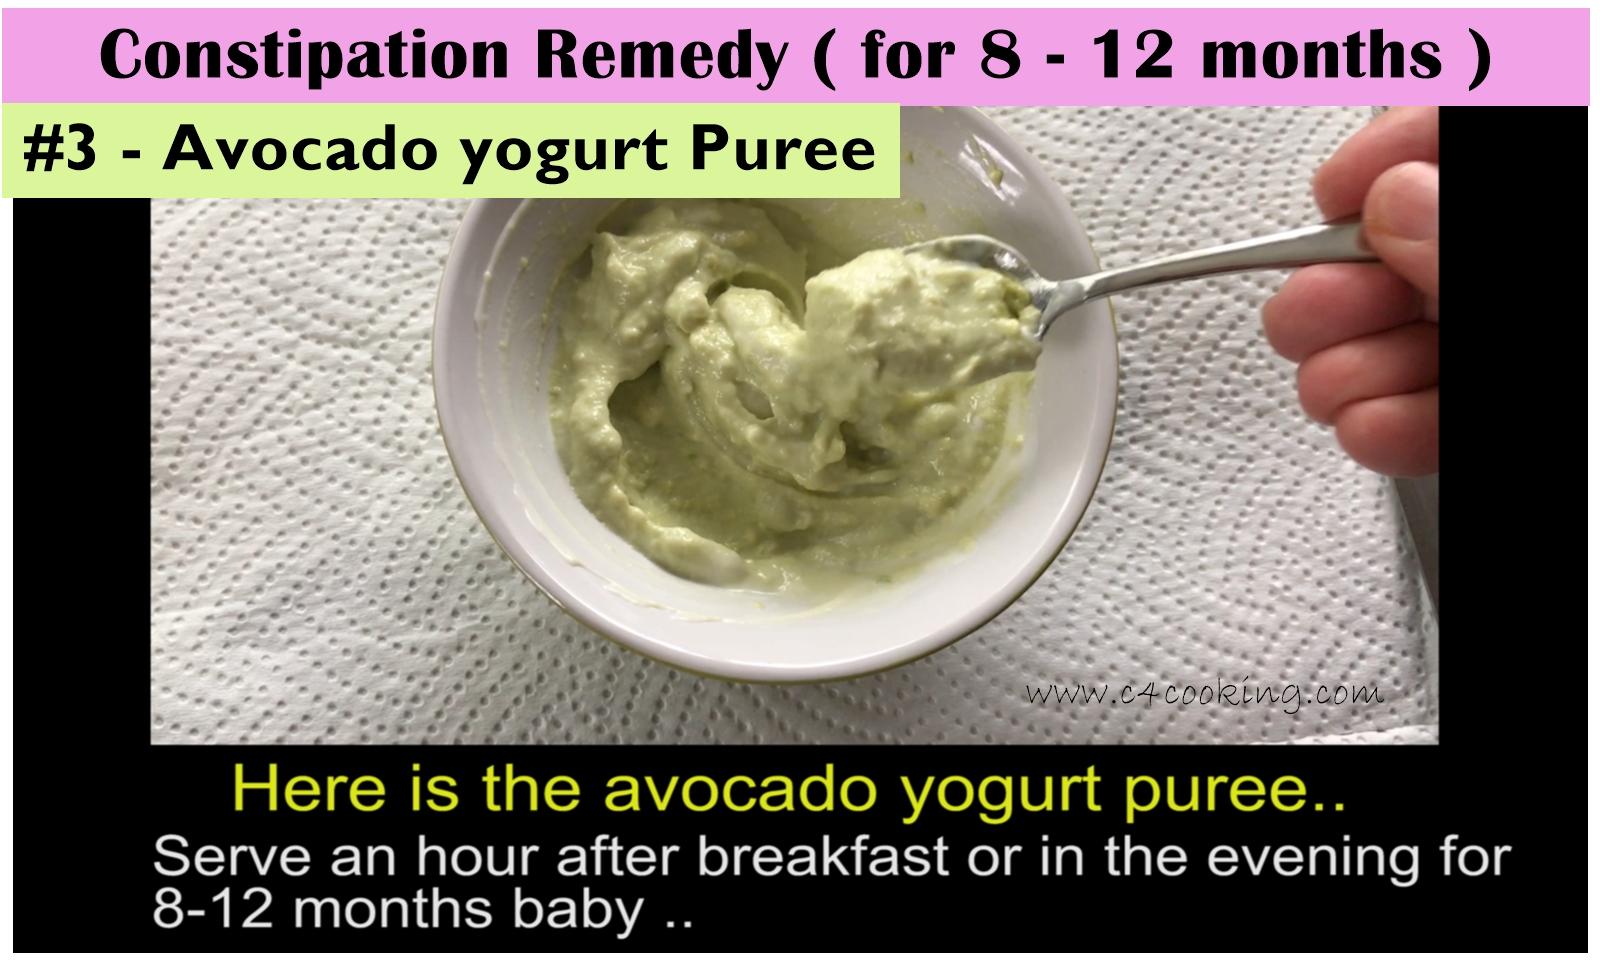 avocado yogurt puree for baby, constiaption relief for 11 months baby, 12months baby cosntipation remedy